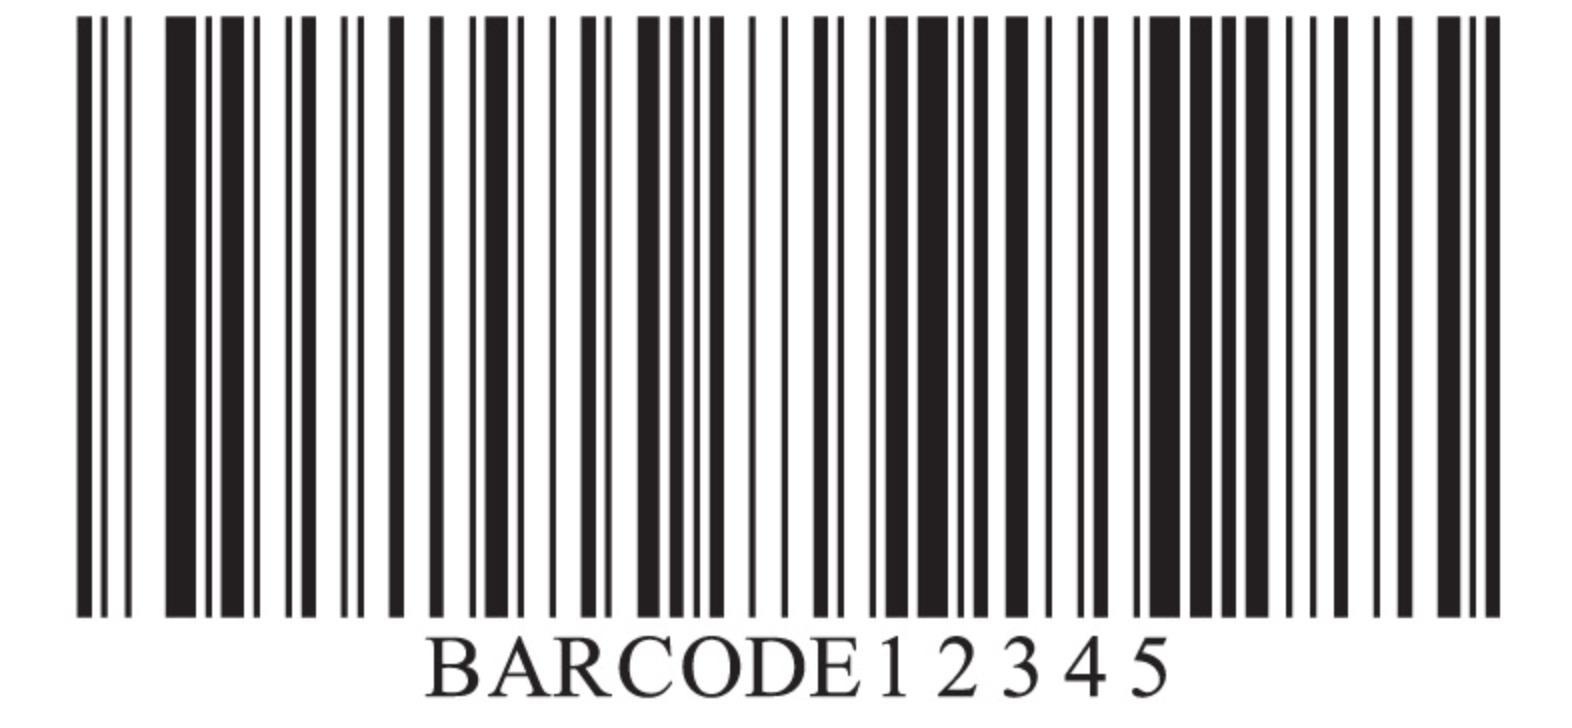 Samplebarcode